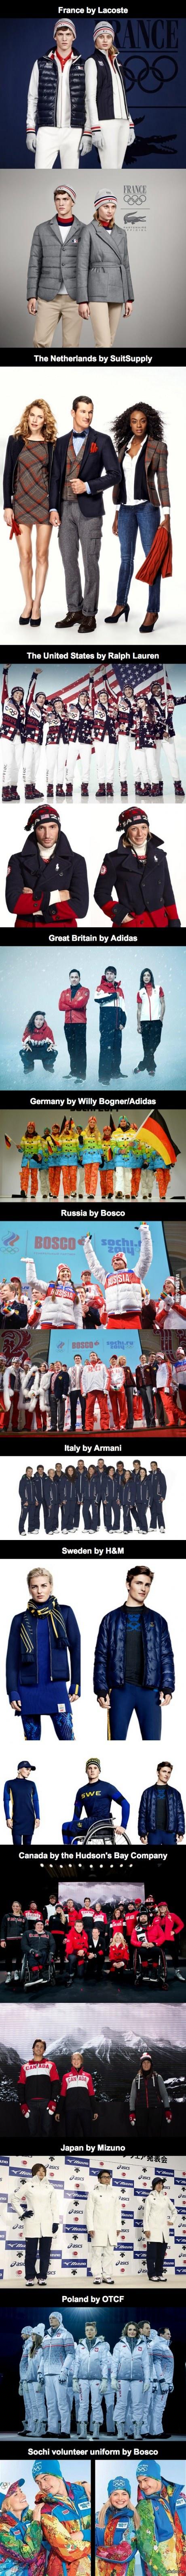 http://s2.pikabu.ru/post_img2/2014/01/26/6/1390720271_2056788911.jpg